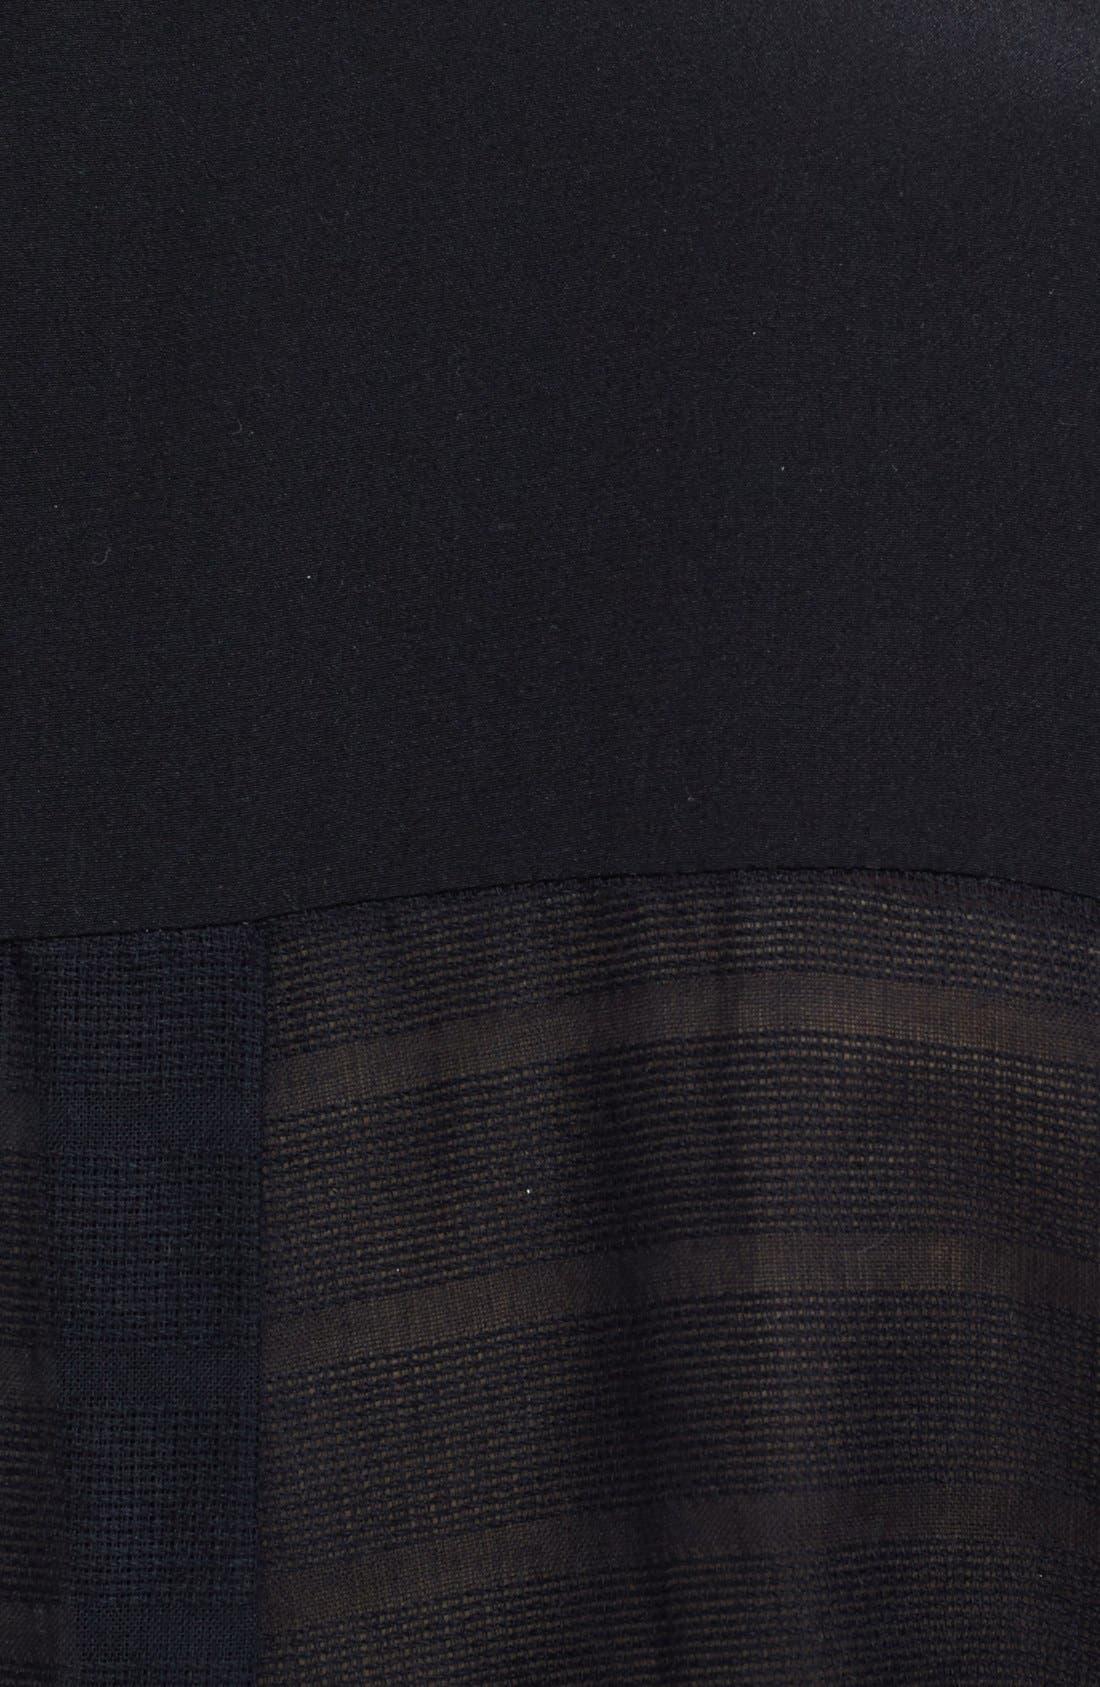 Alternate Image 3  - Veronica Beard Sleeveless Cotton Voile Shirt